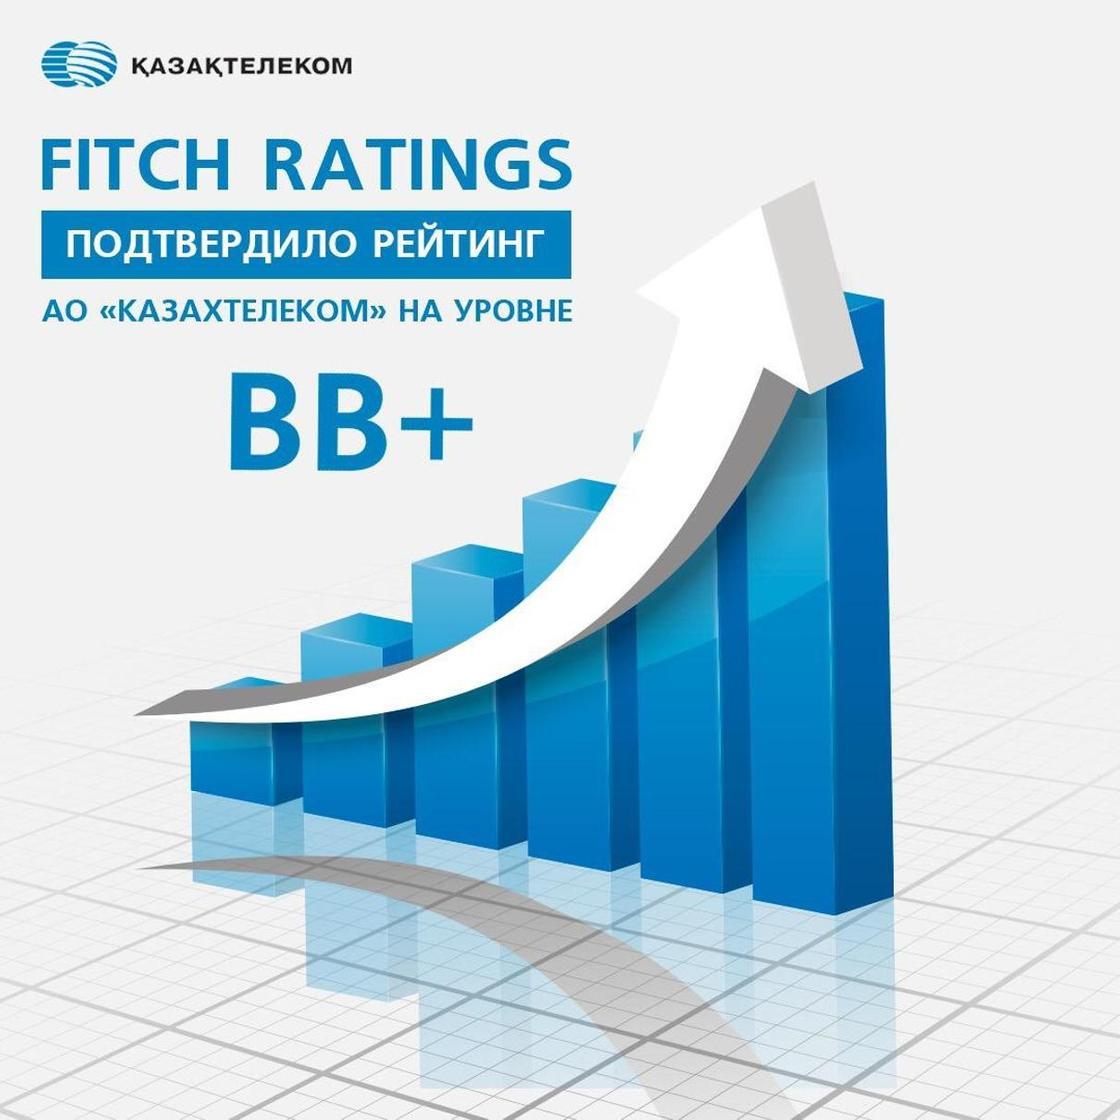 Fitch Ratings подтвердило рейтинг АО «Казахтелеком» на уровне ВВ plus